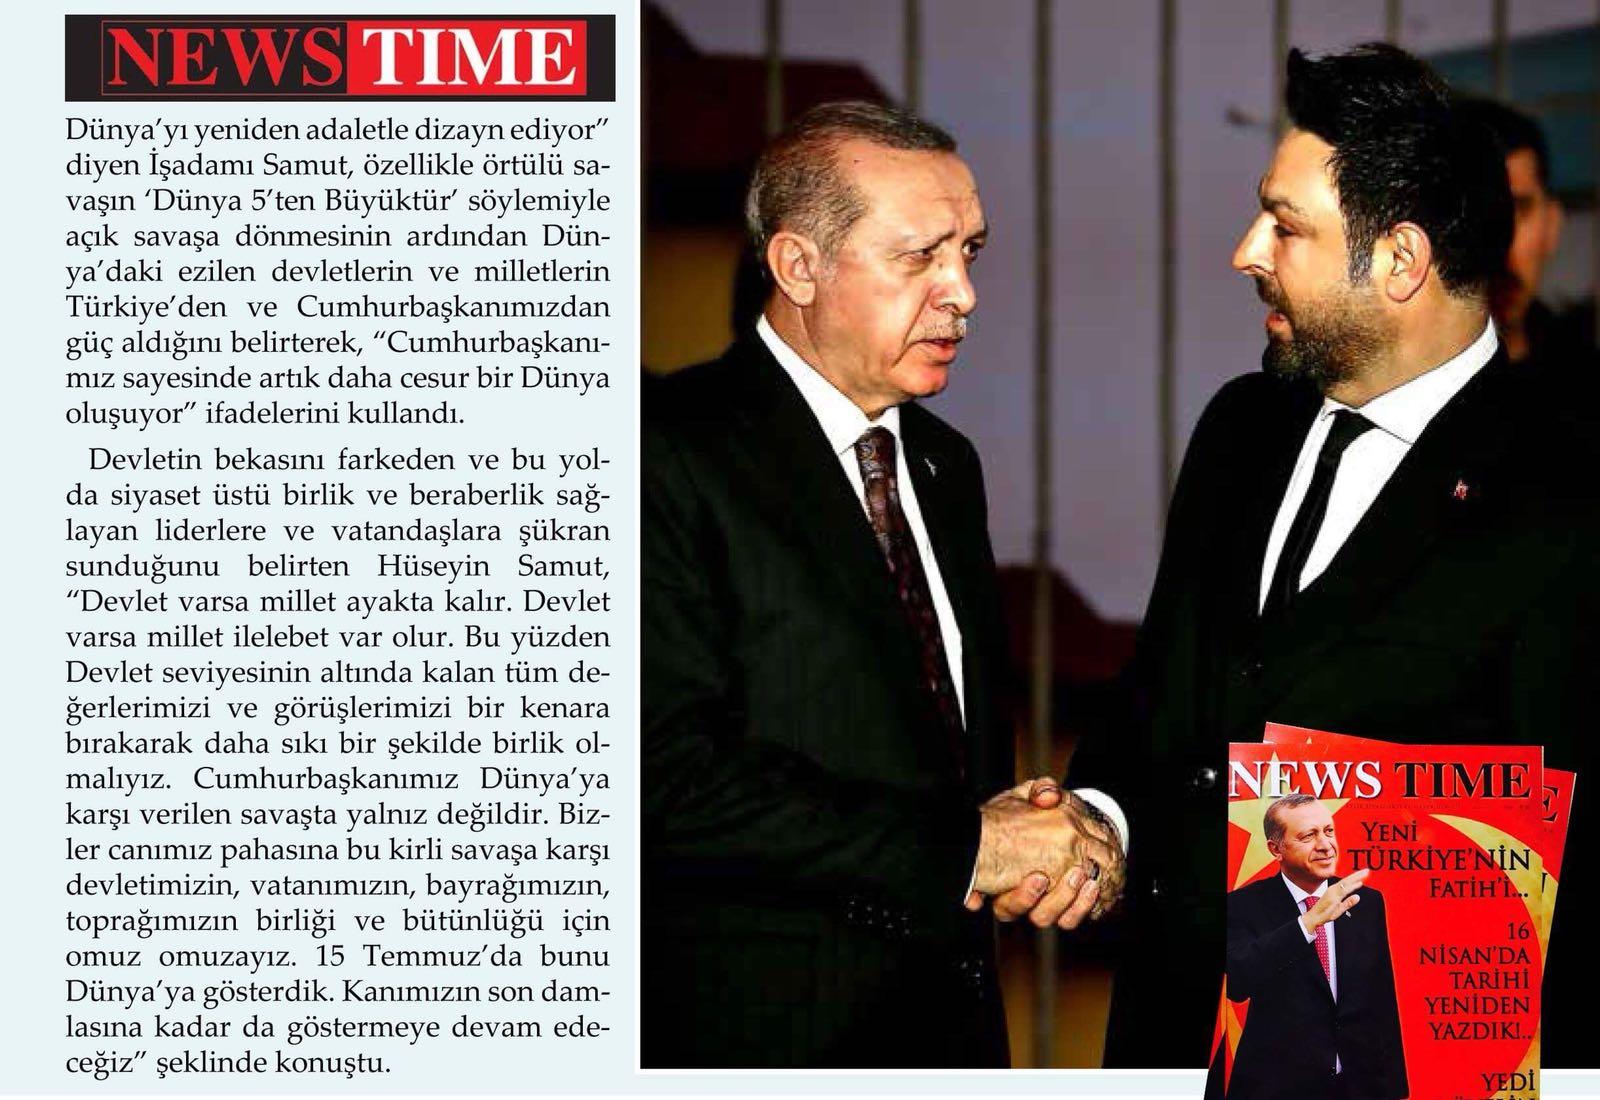 News Time - Recep Tayyip Erdoğan